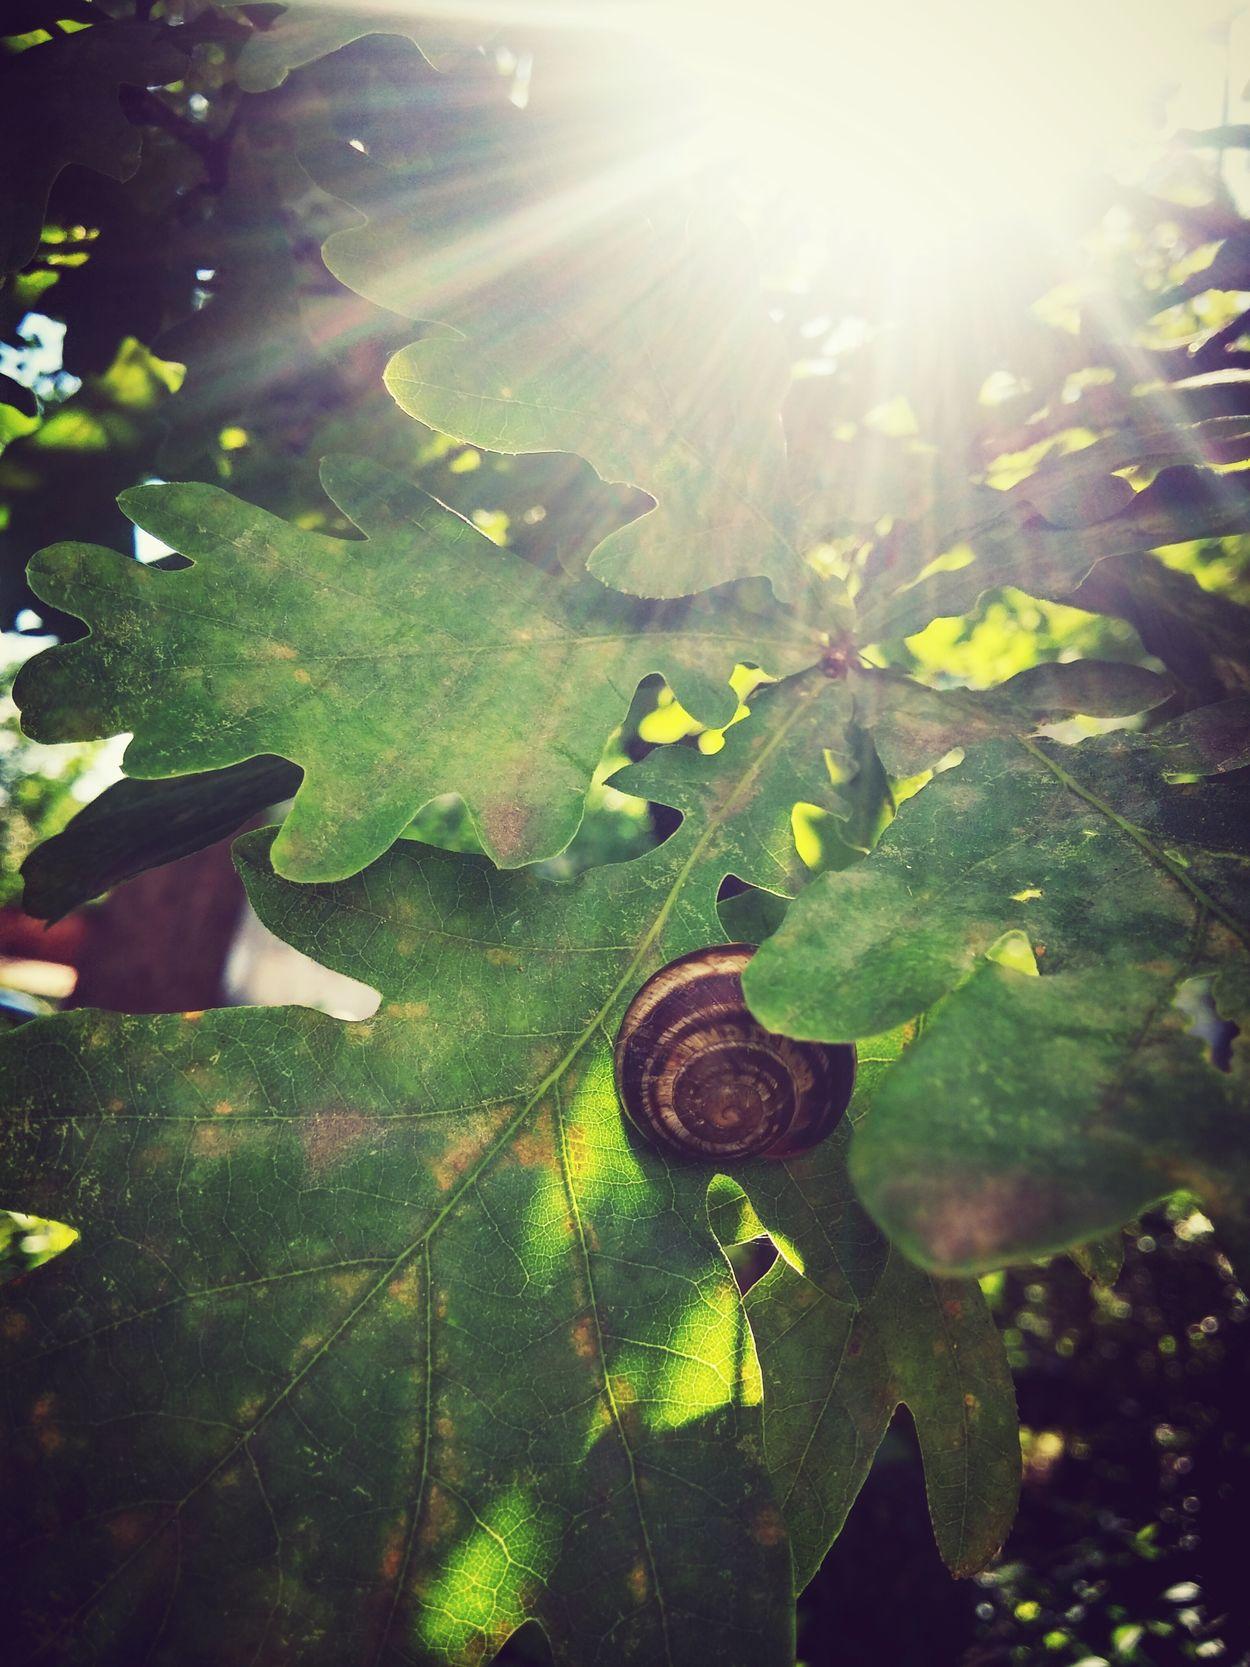 Pray Afterlife Shelter Sleep Eternal Sleep Snail Leaves Sunshine End Of Life Snailedit Sunbeam Accomplished Death